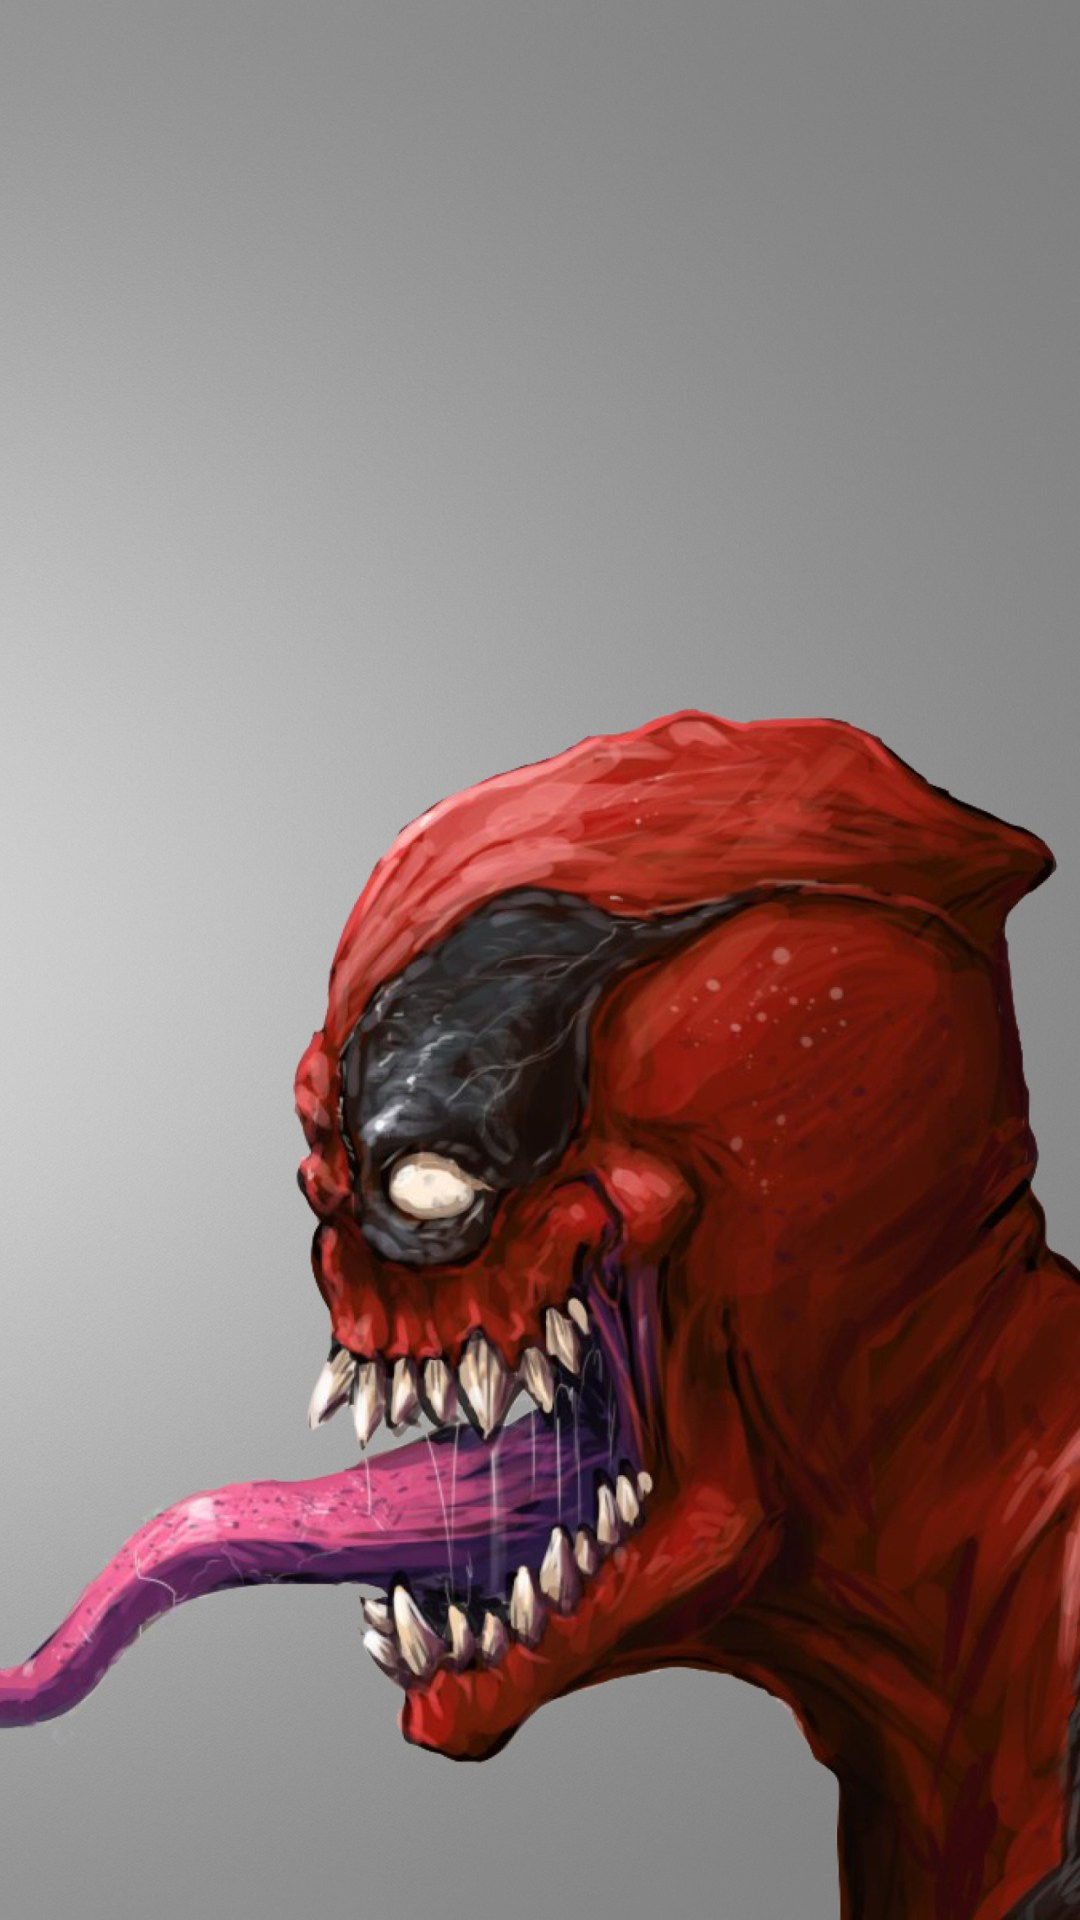 Deadpool iphone wallpaper images IphoneWallrucom 1080x1920